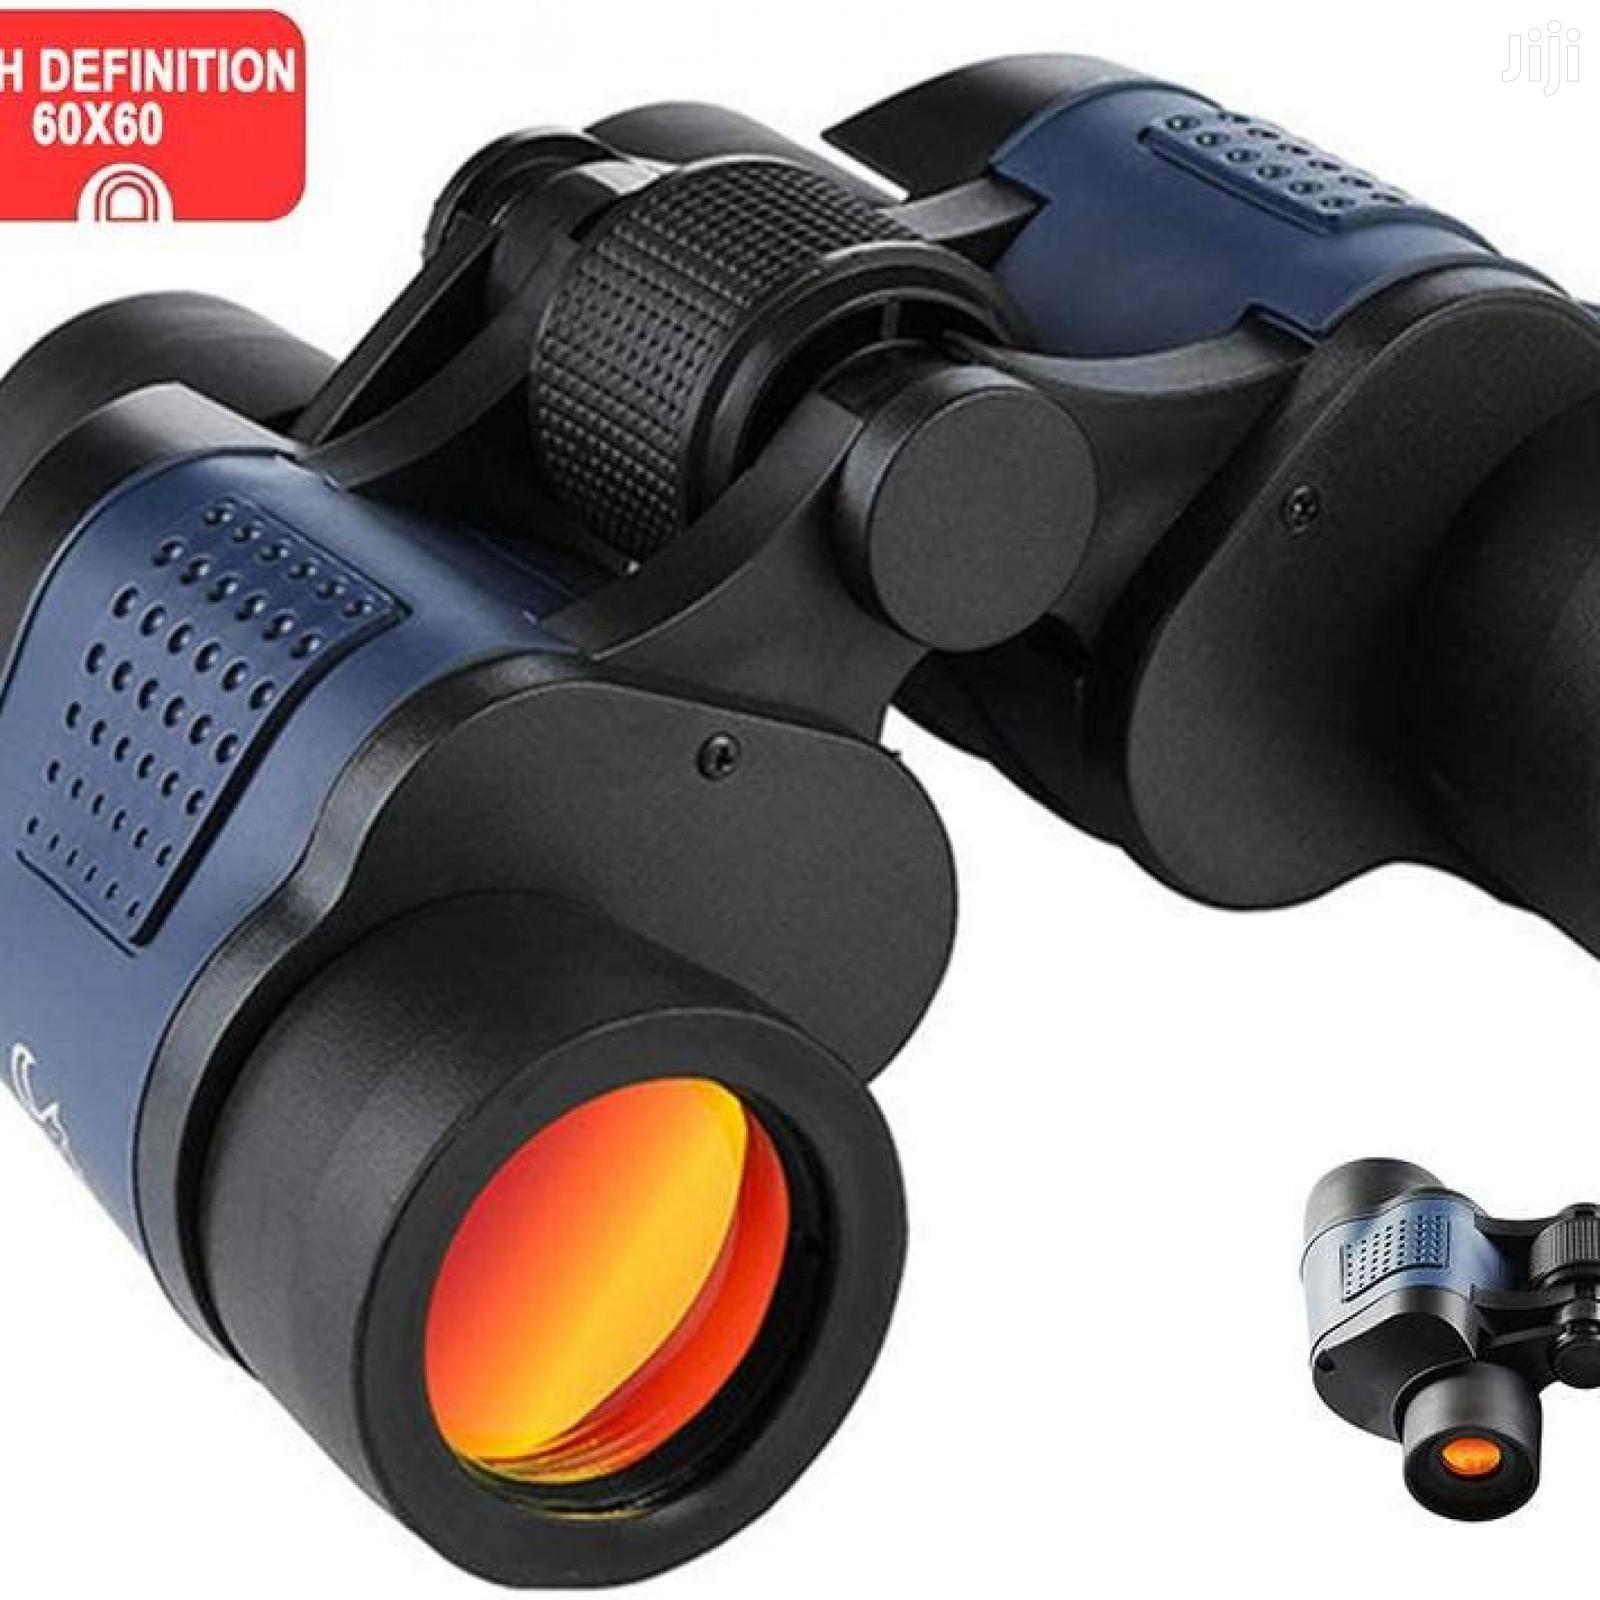 HD Binoculars-60x60 | Camping Gear for sale in Nairobi Central, Nairobi, Kenya